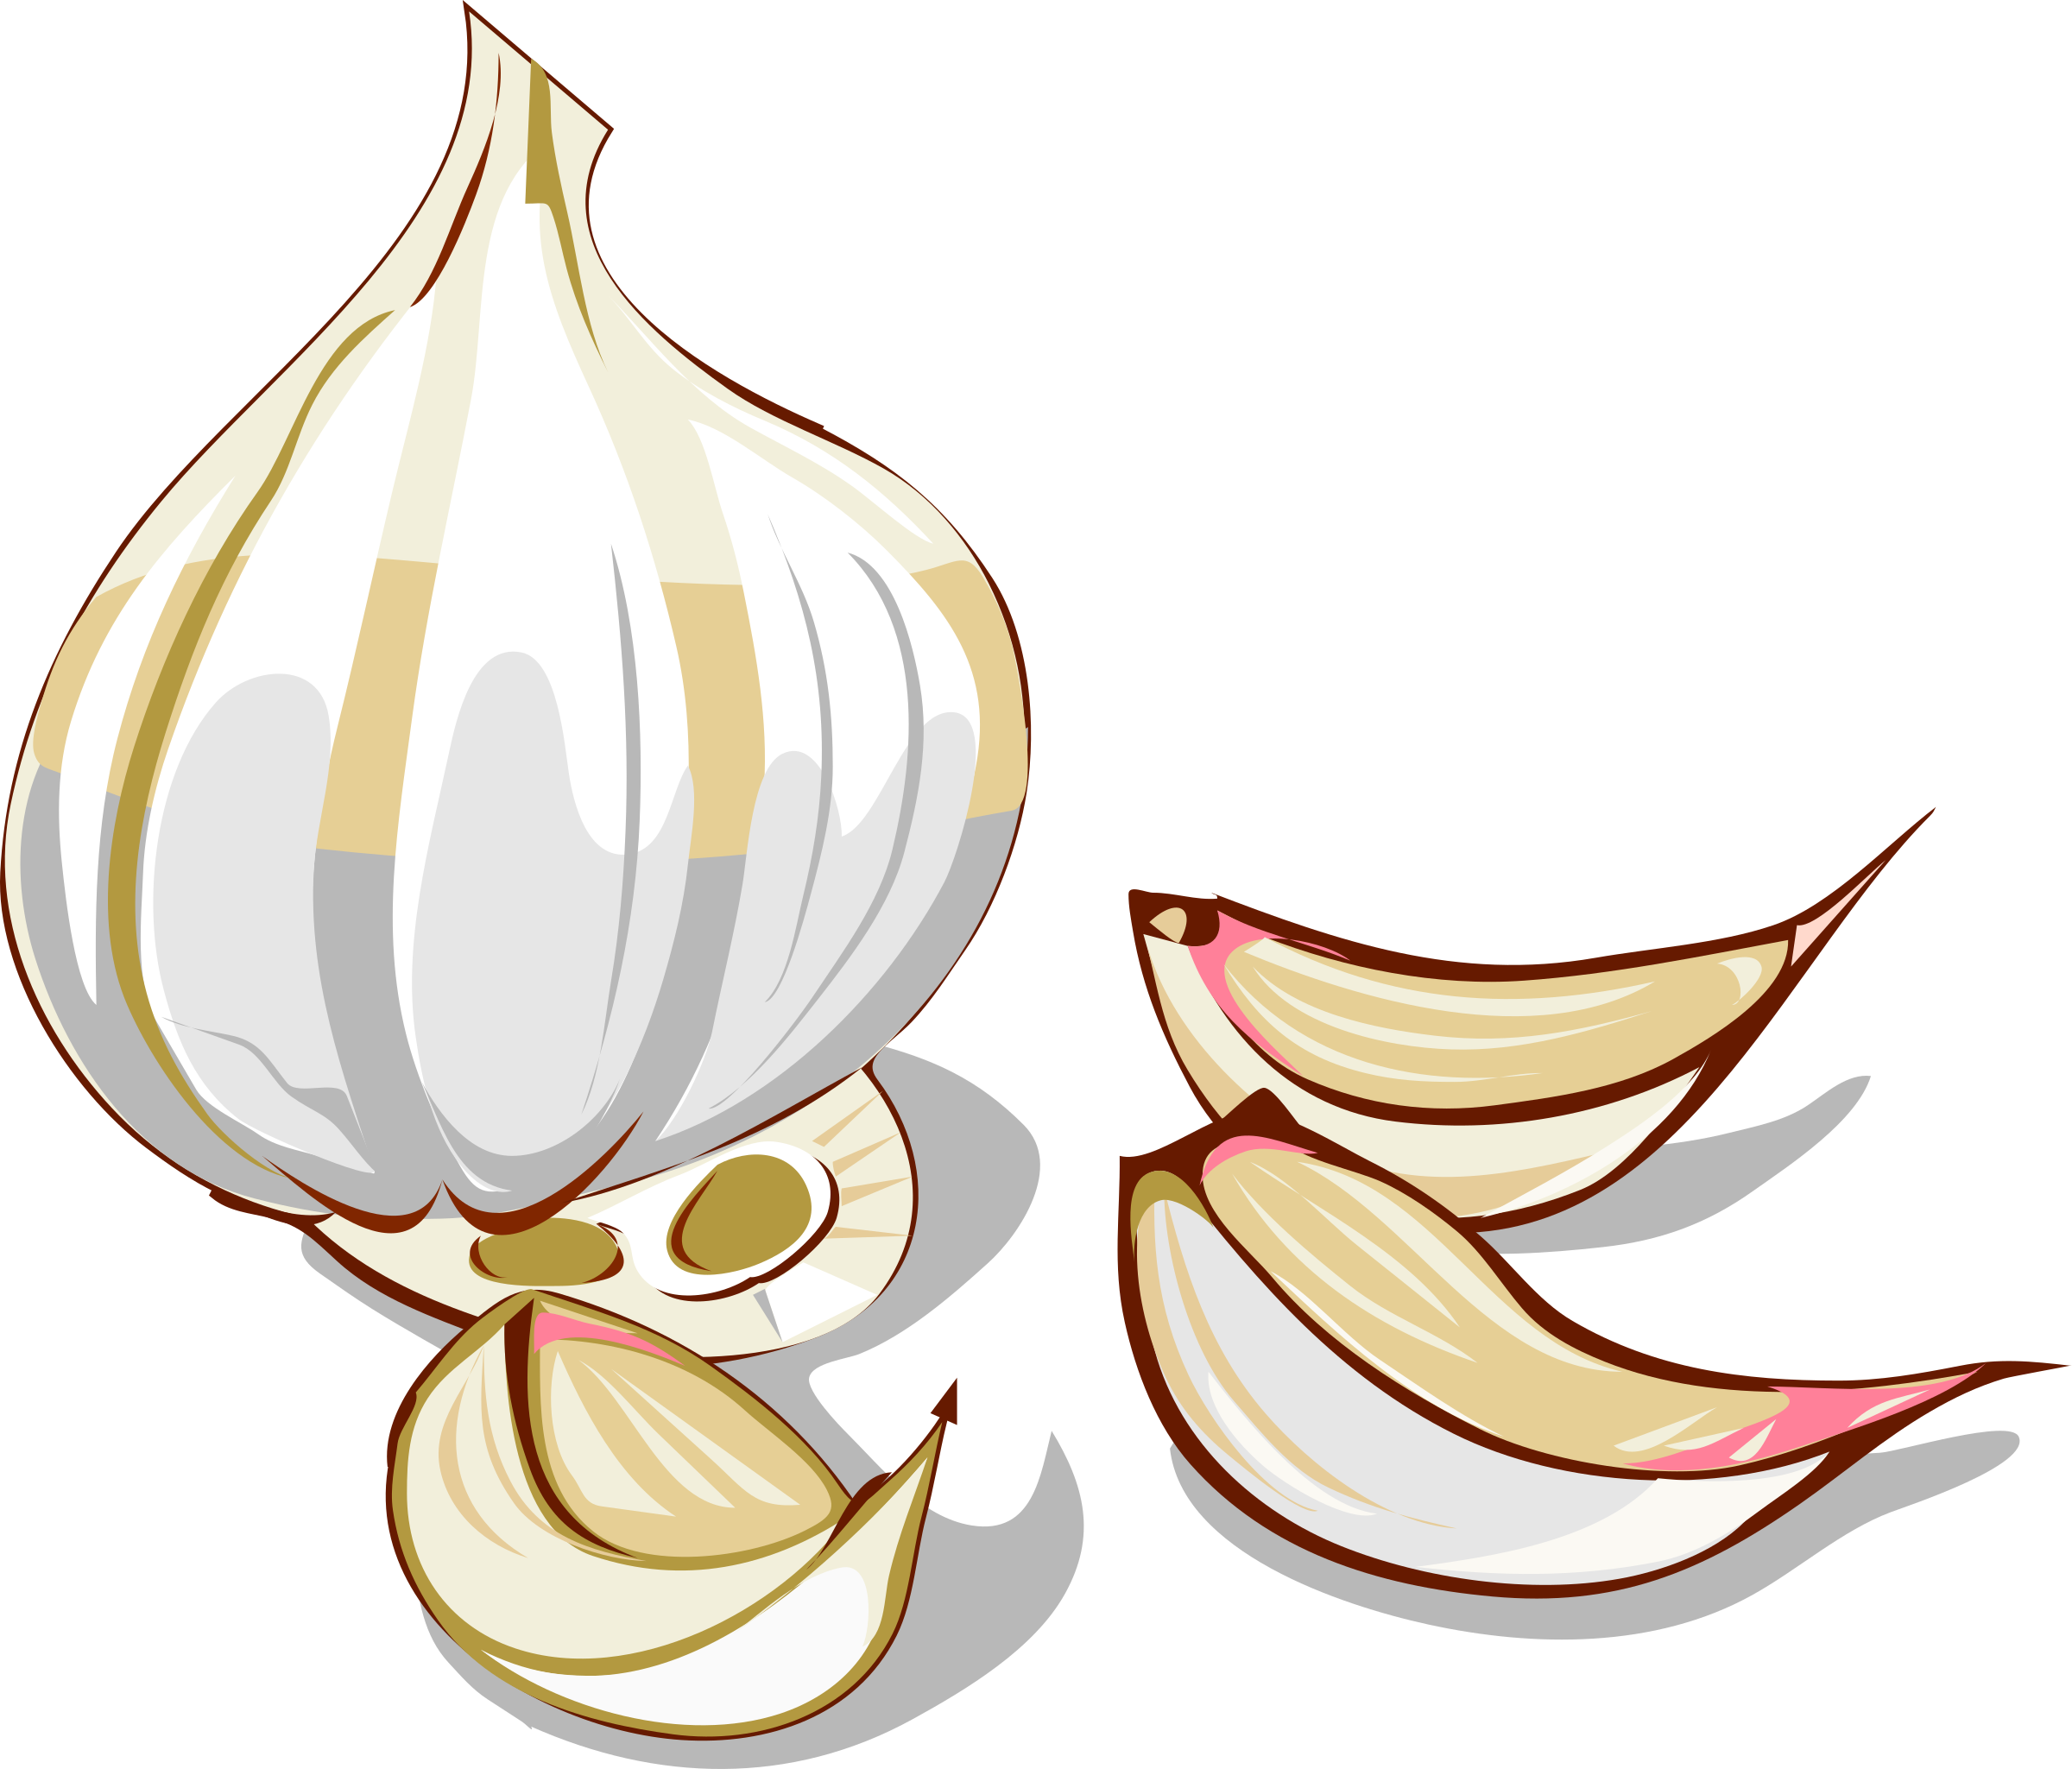 Bed tyme tales storyland. Garlic clipart illustration